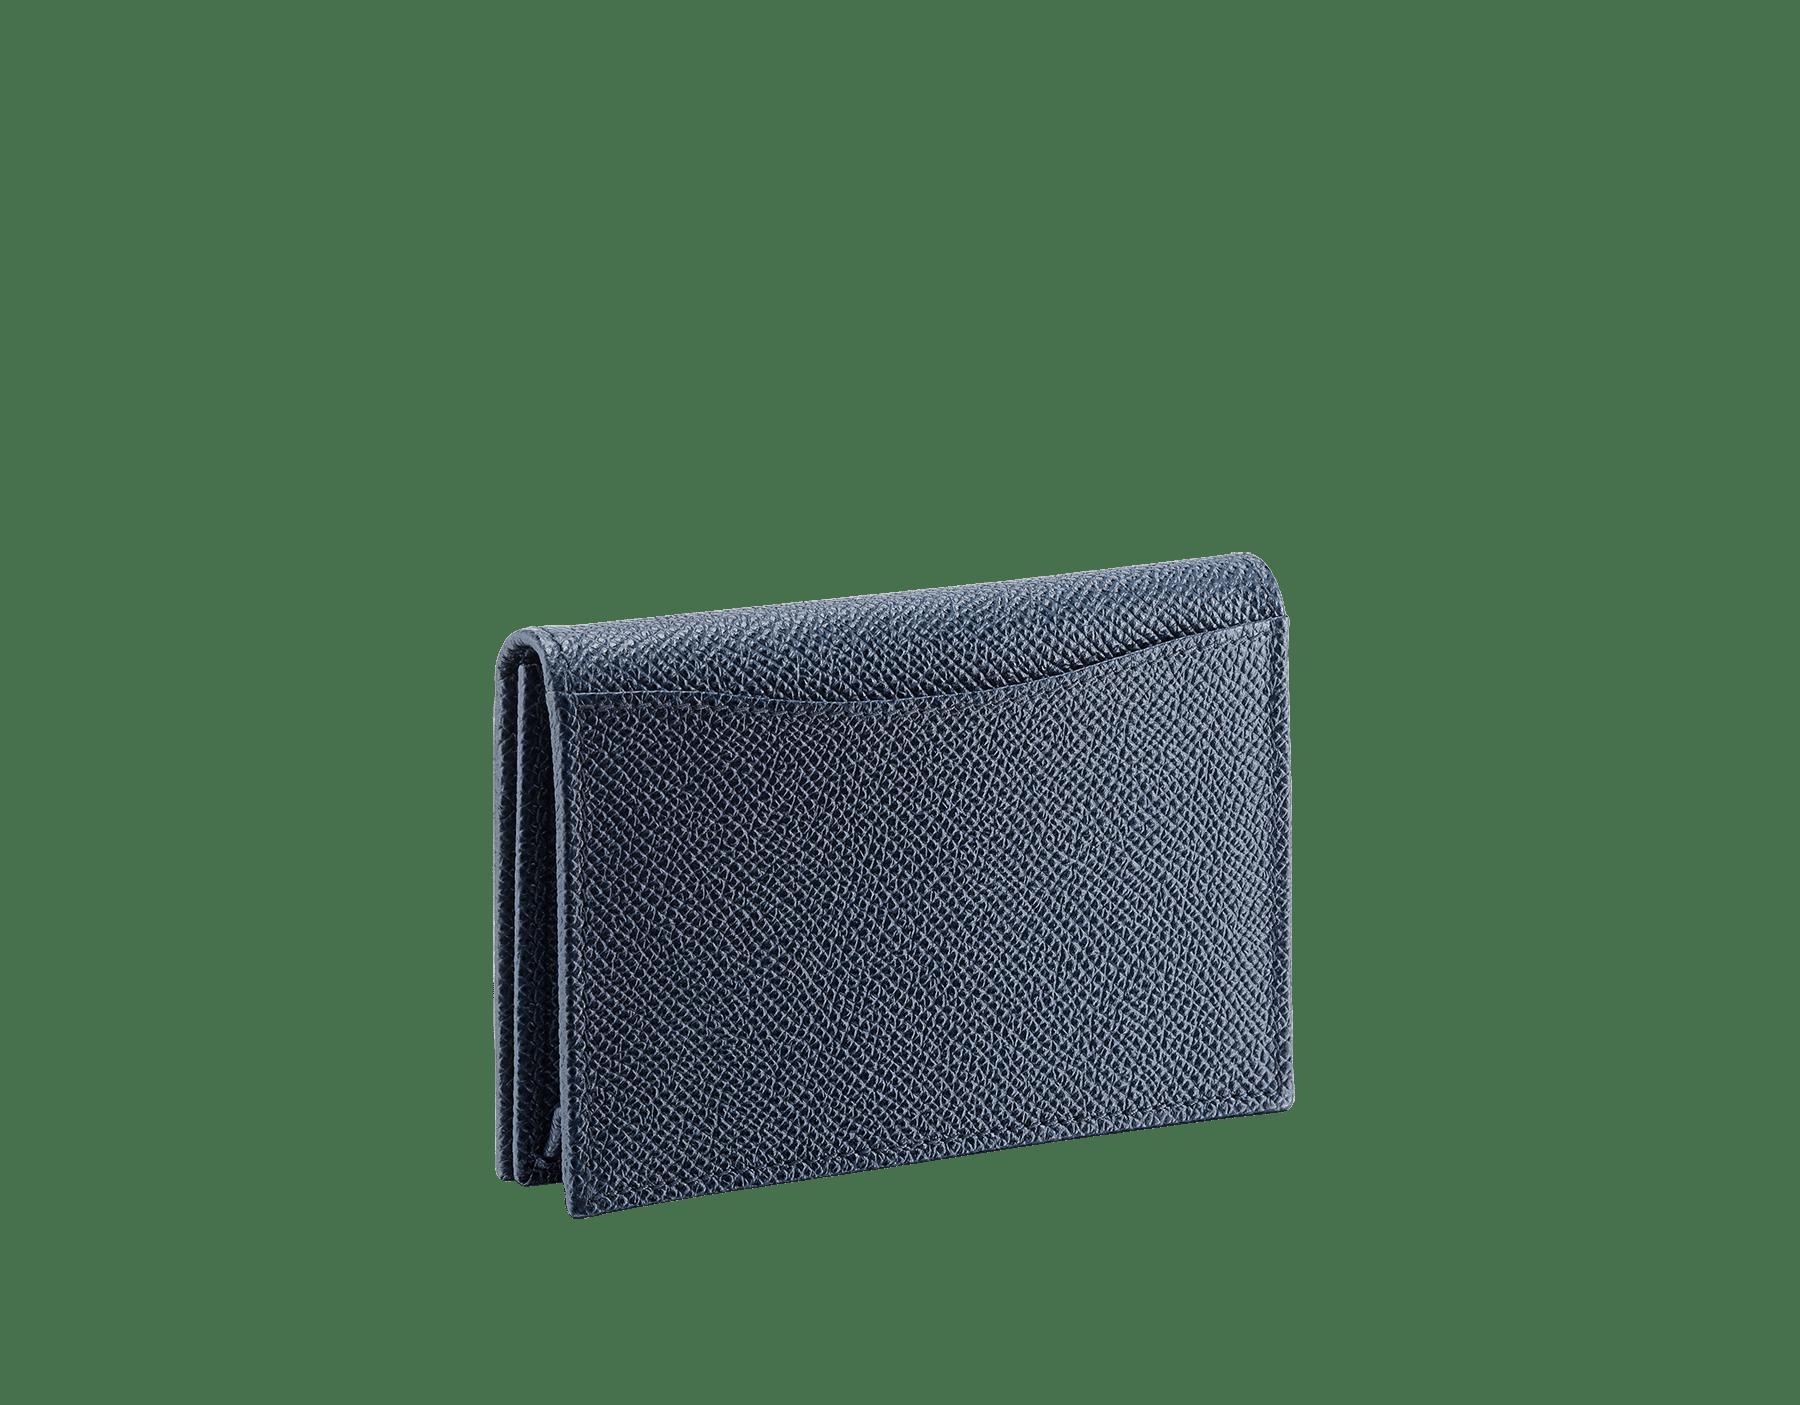 BVLGARI BVLGARI business card holder in denim sapphire and charcoal diamond grain calf leather, with brass palladium plated logo decoration. 289116 image 3